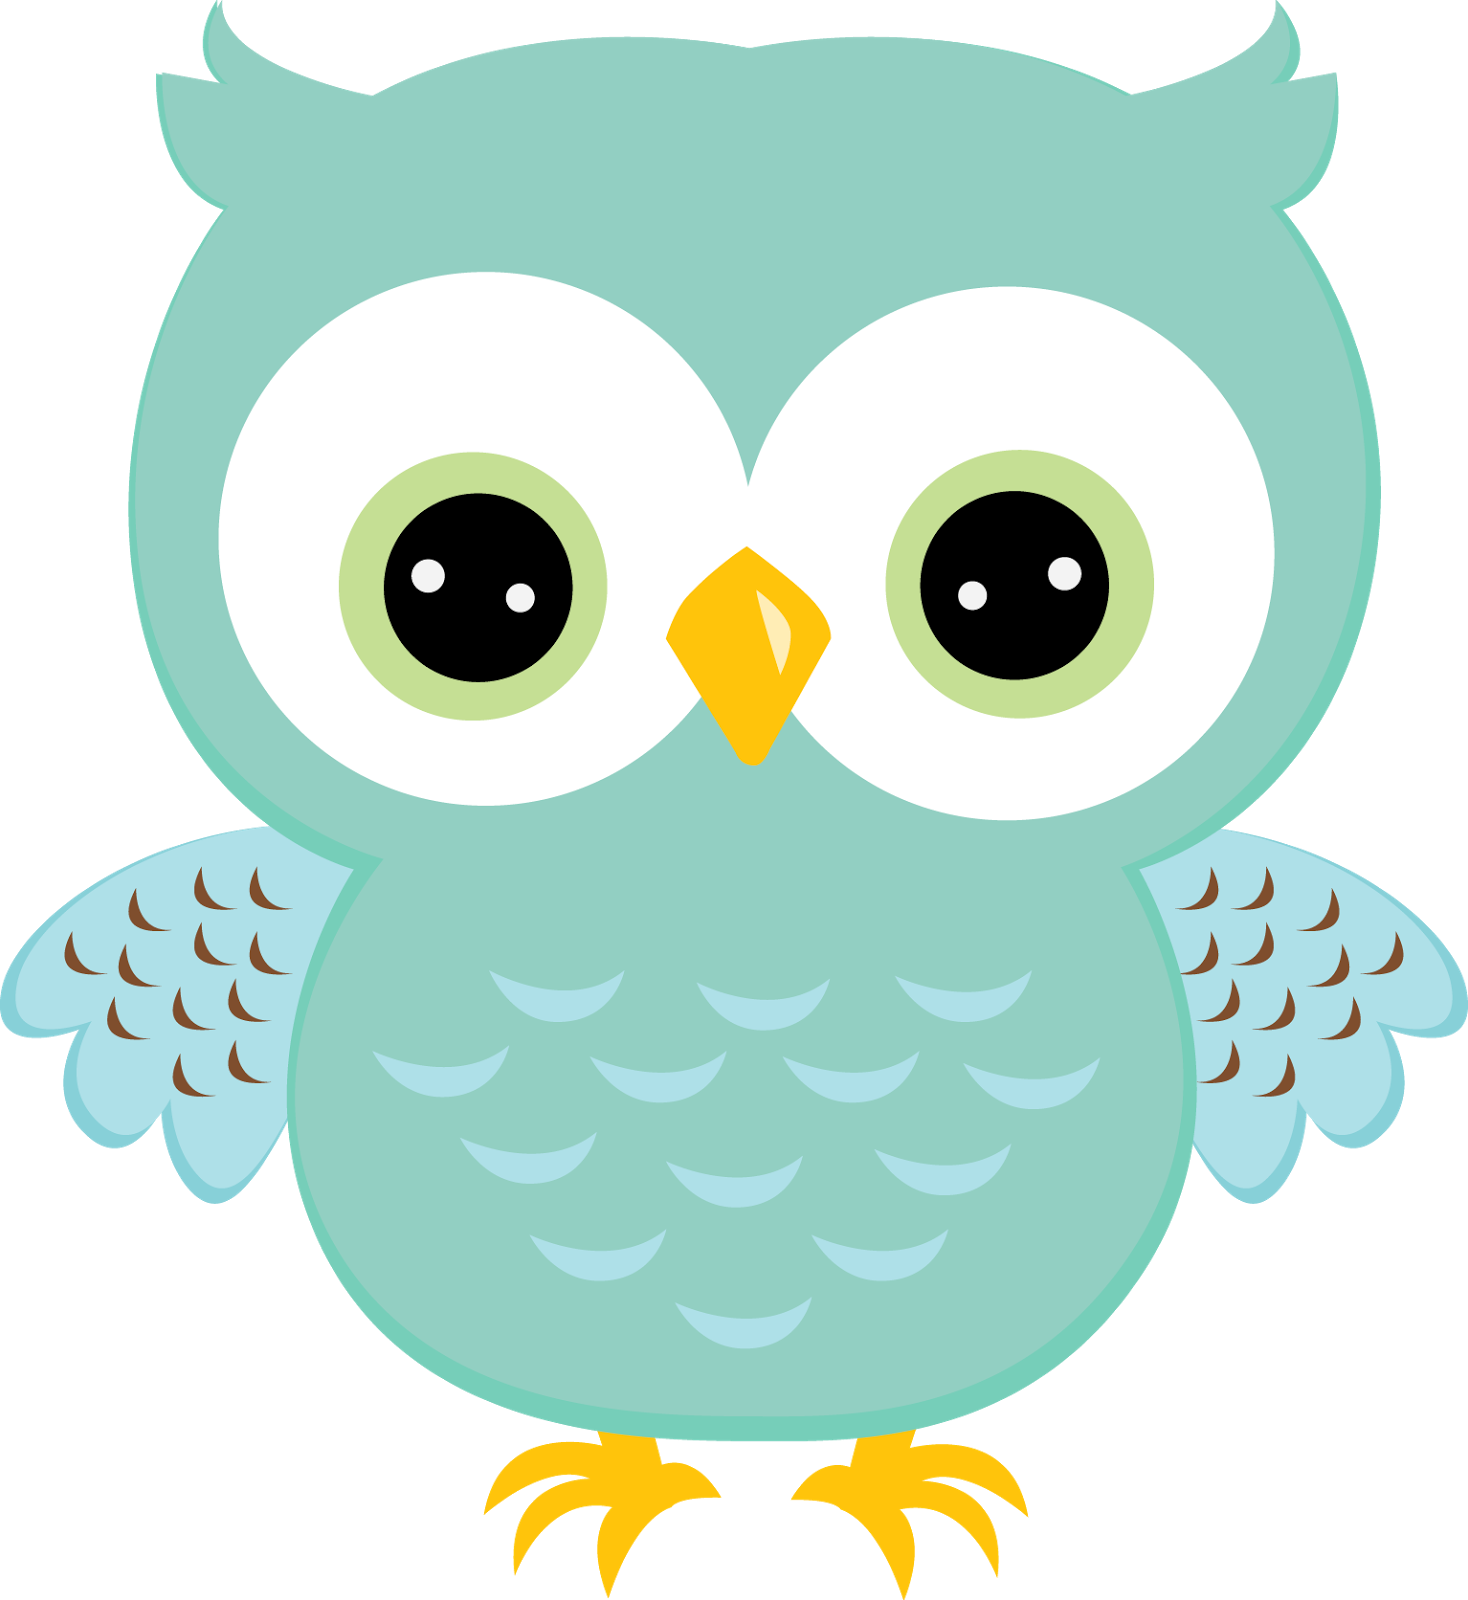 Ibdb ujbzjxza png pixels. Clipart bird owl